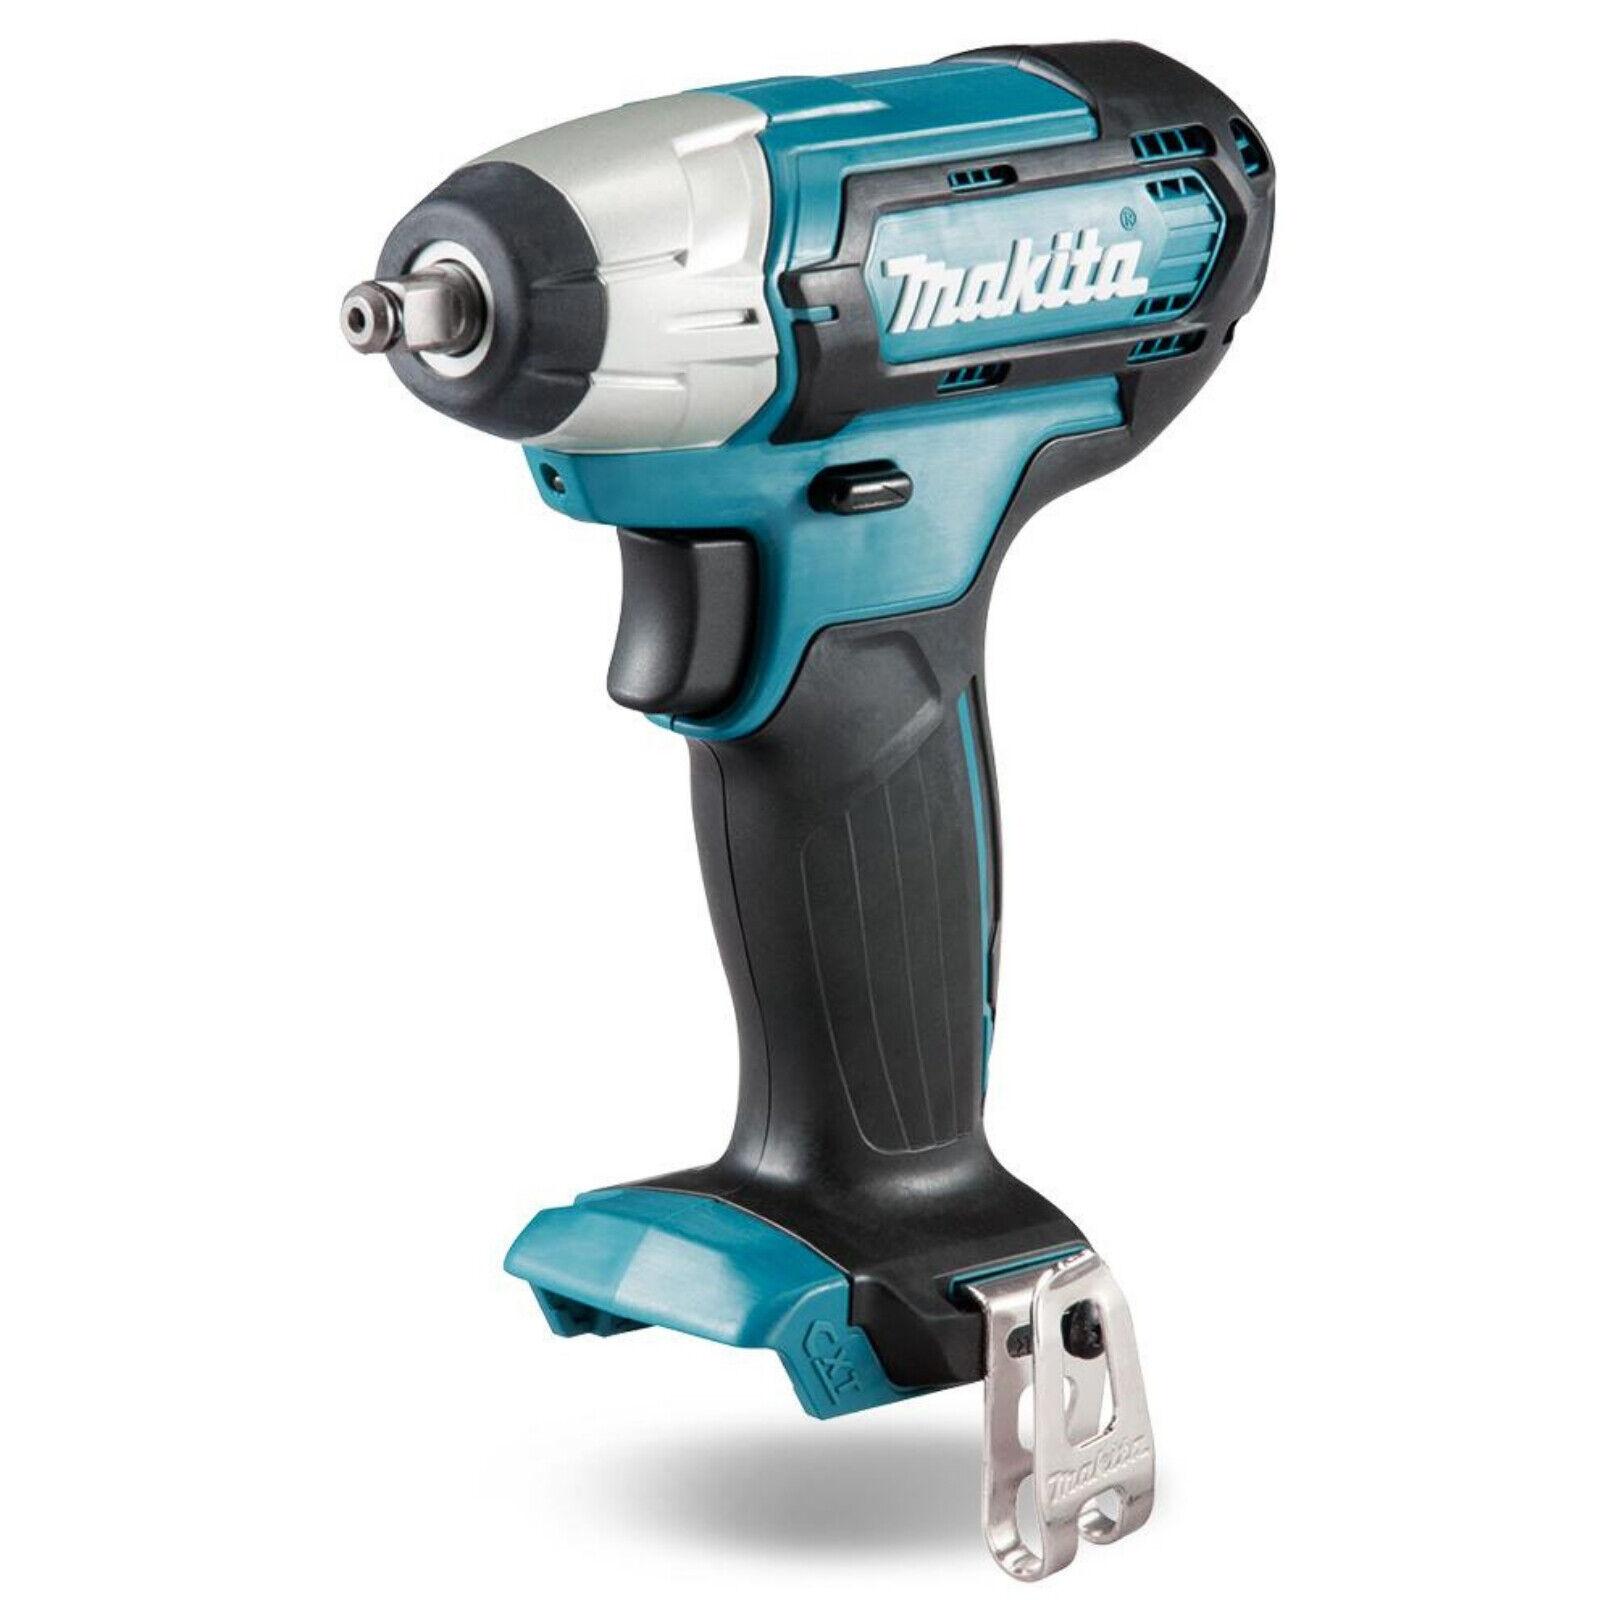 Makita  TW100 10.8V Cordless Impact Wrench bare tool TW100d TW100dz